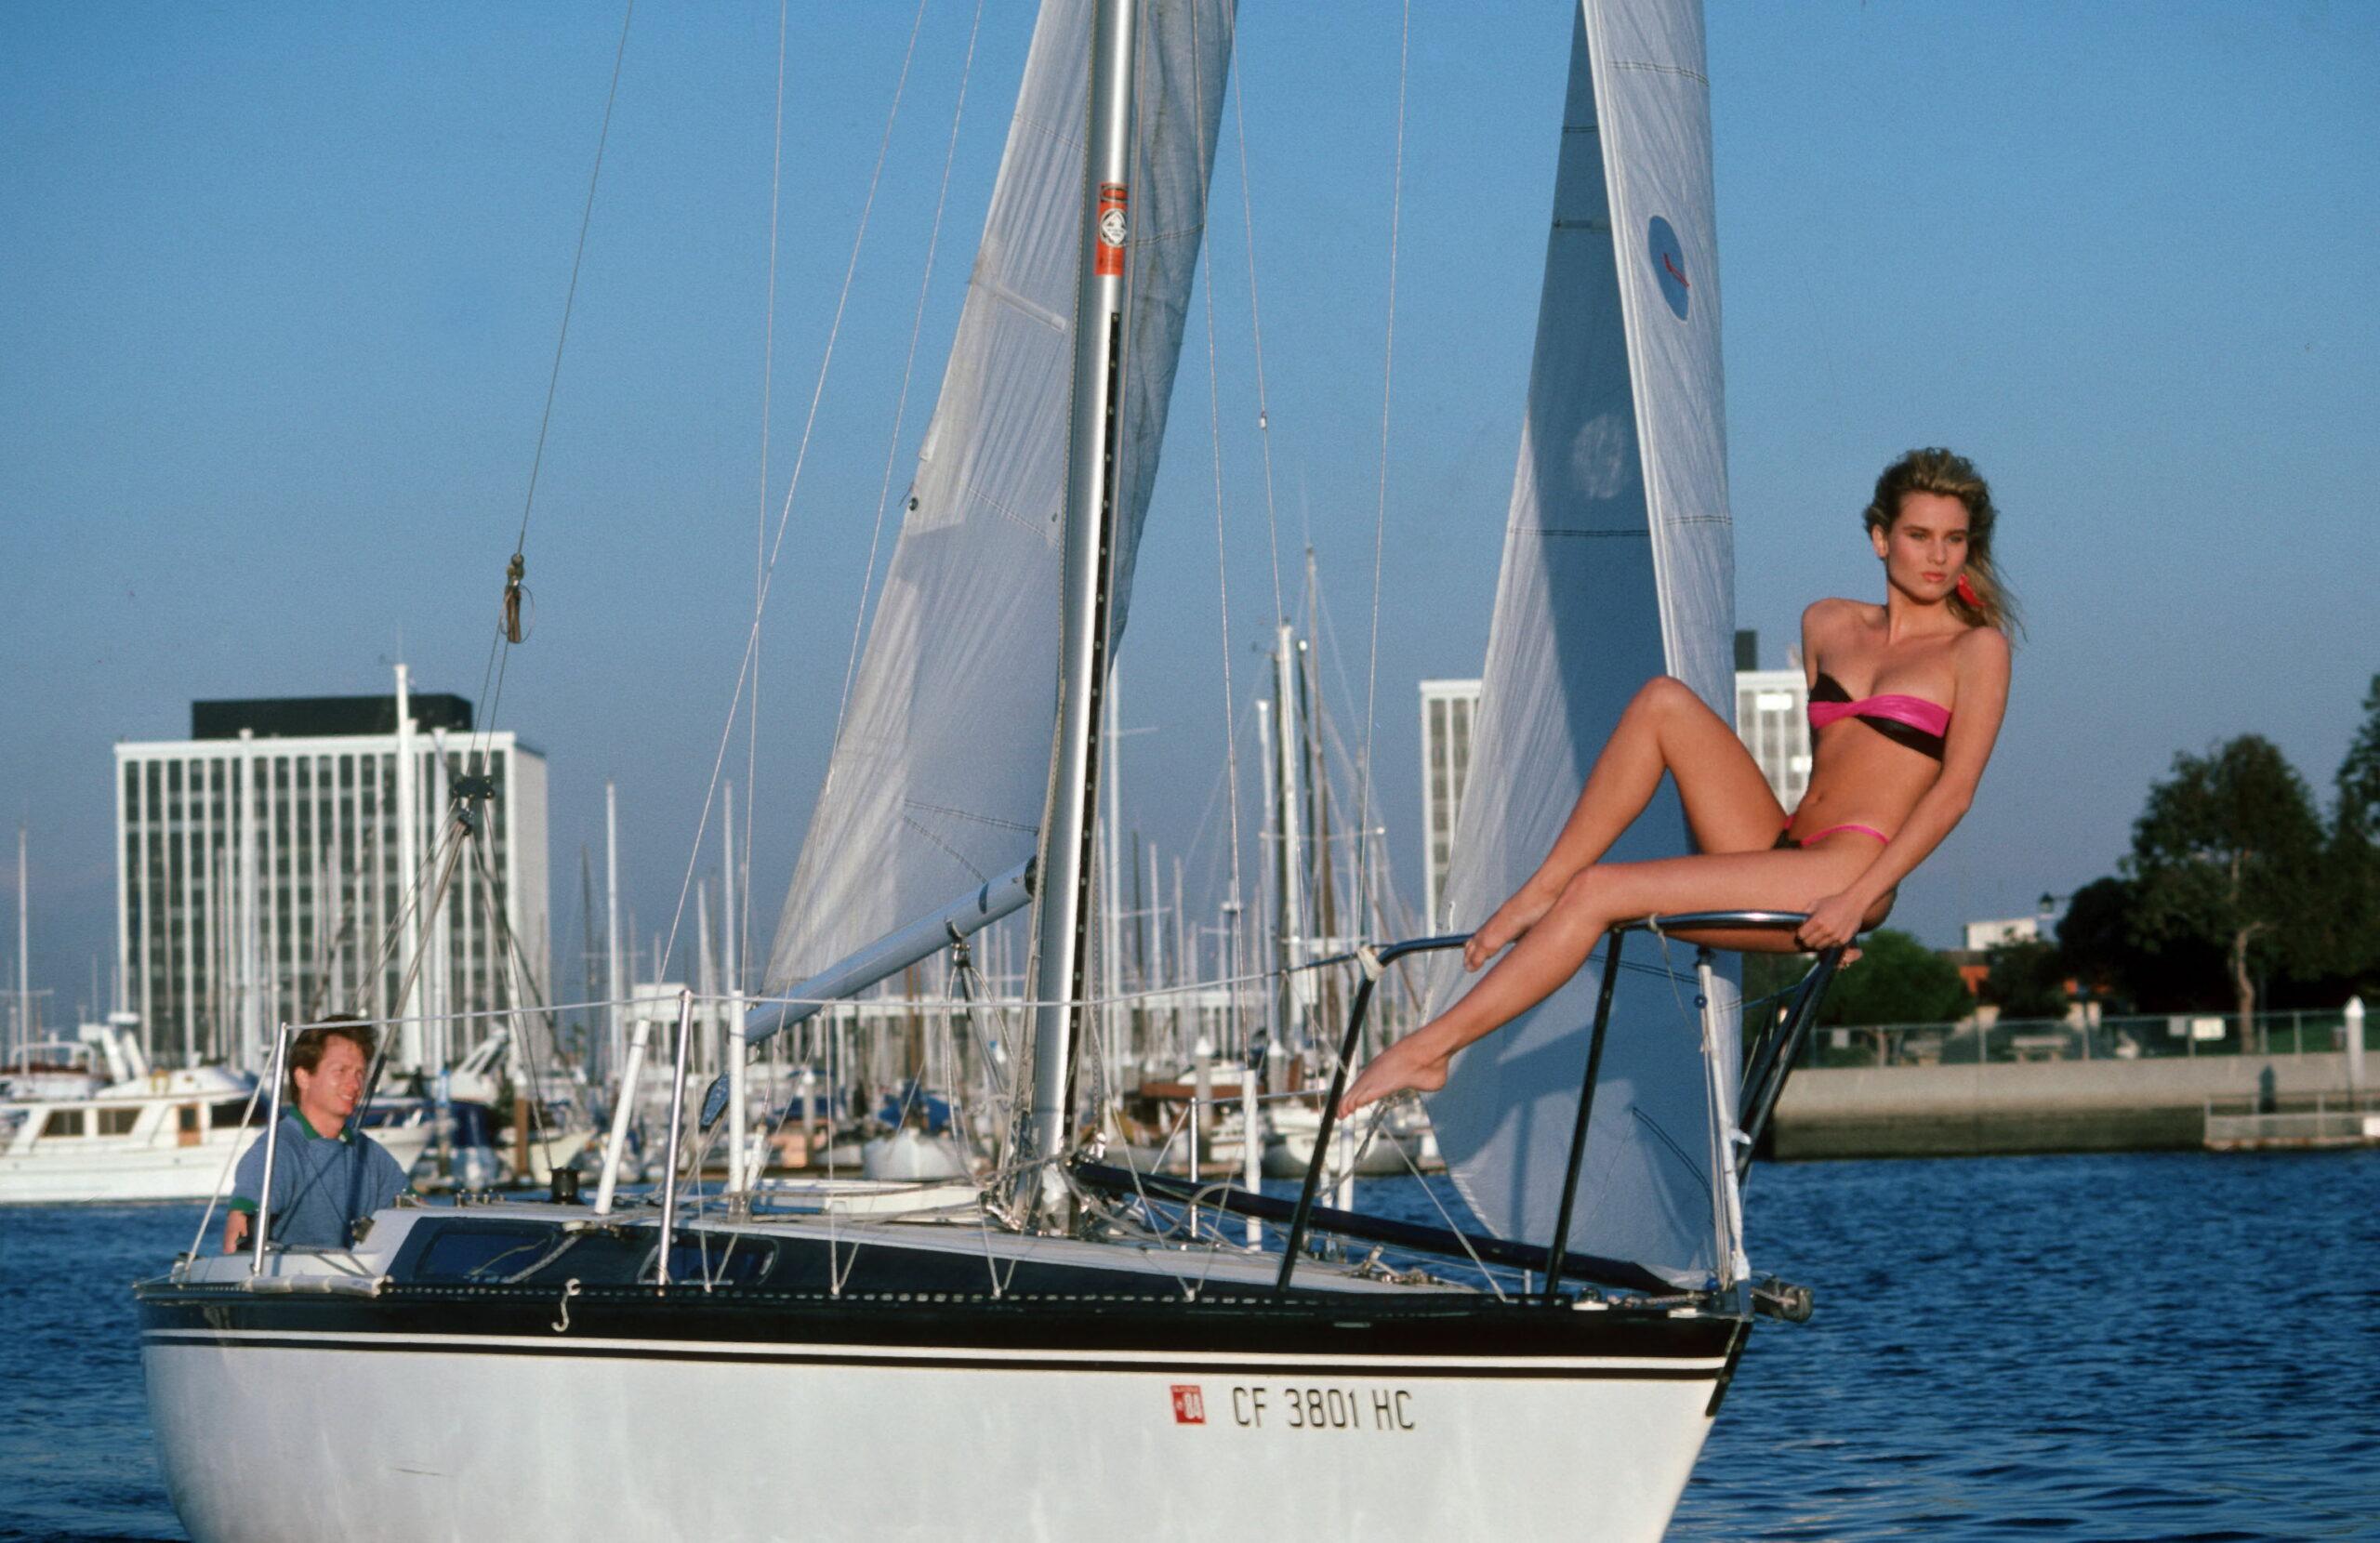 Grande donna su piccola barca